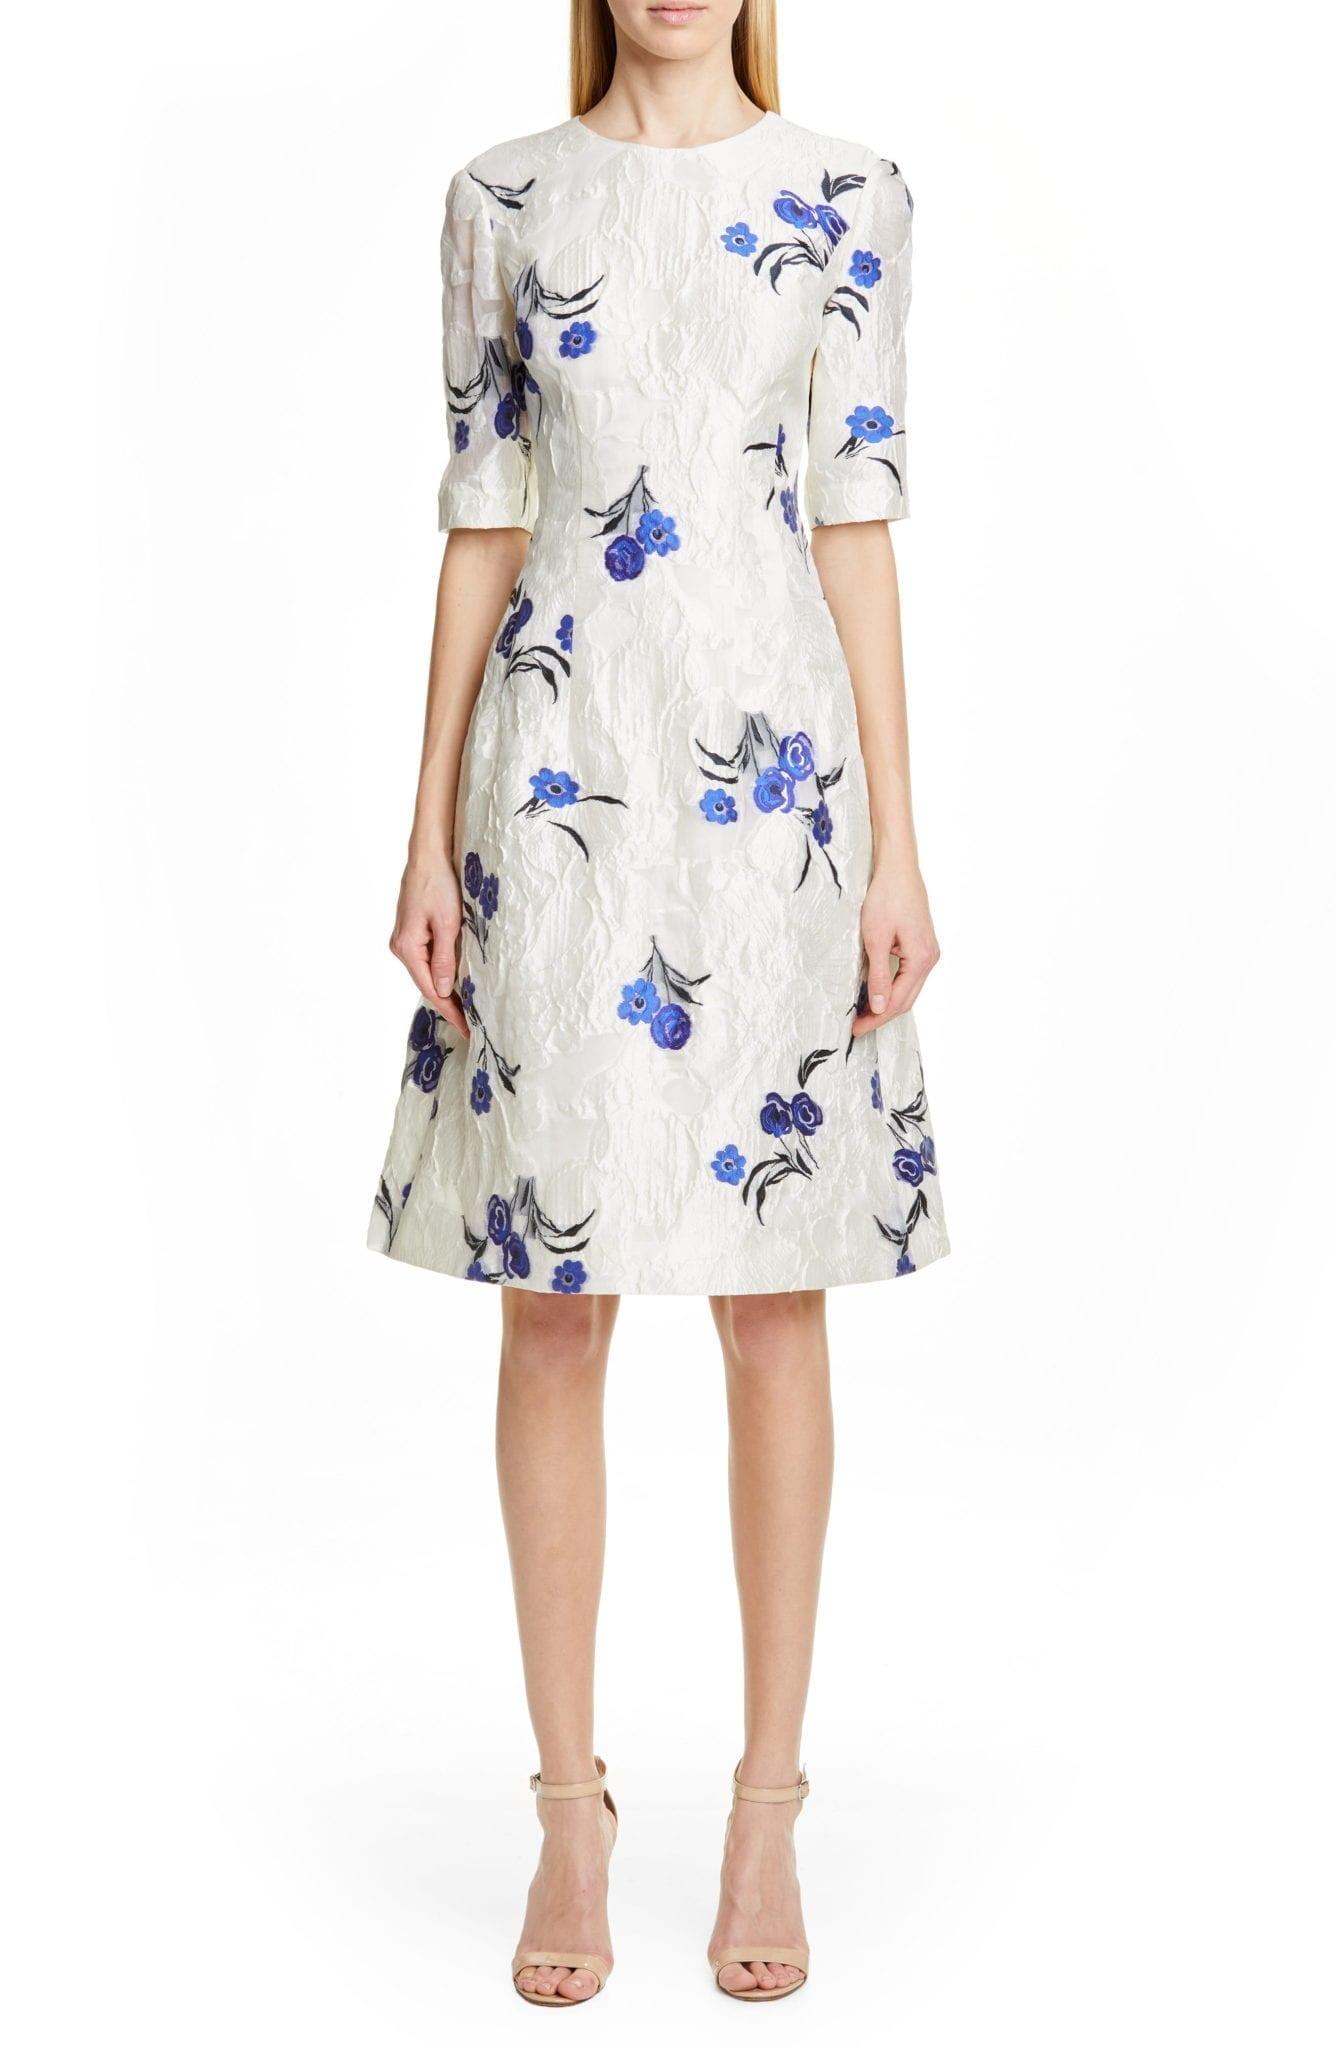 LELA ROSE Holly Floral Jacquard Fit & Flare Ivory Dress